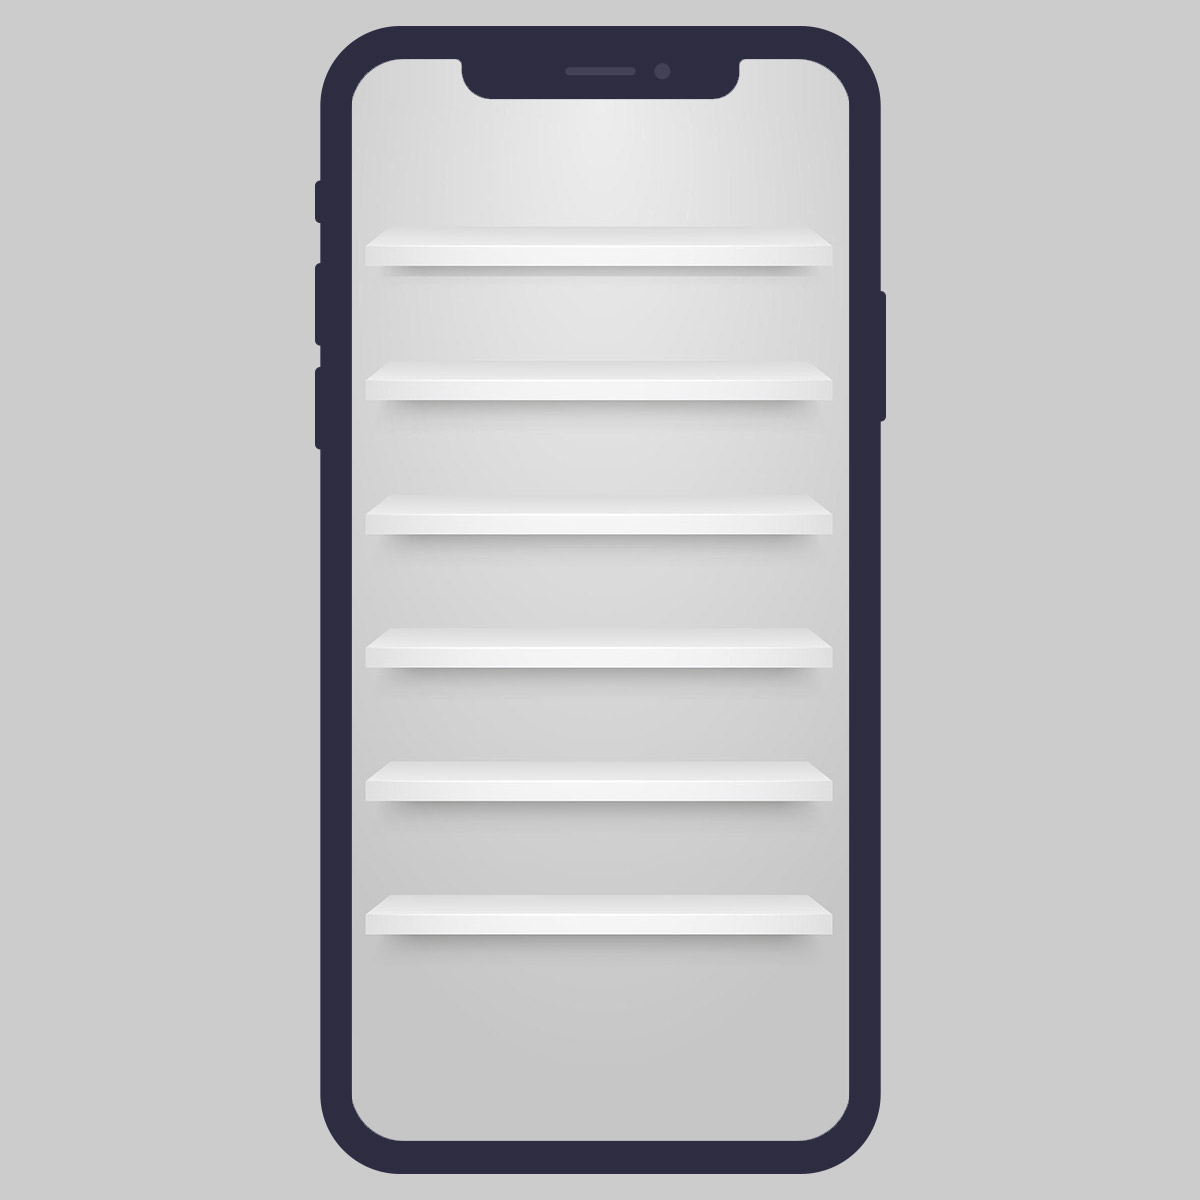 Creative Iphone Wallpapers To Make Your Apps Look Good Hongkiat